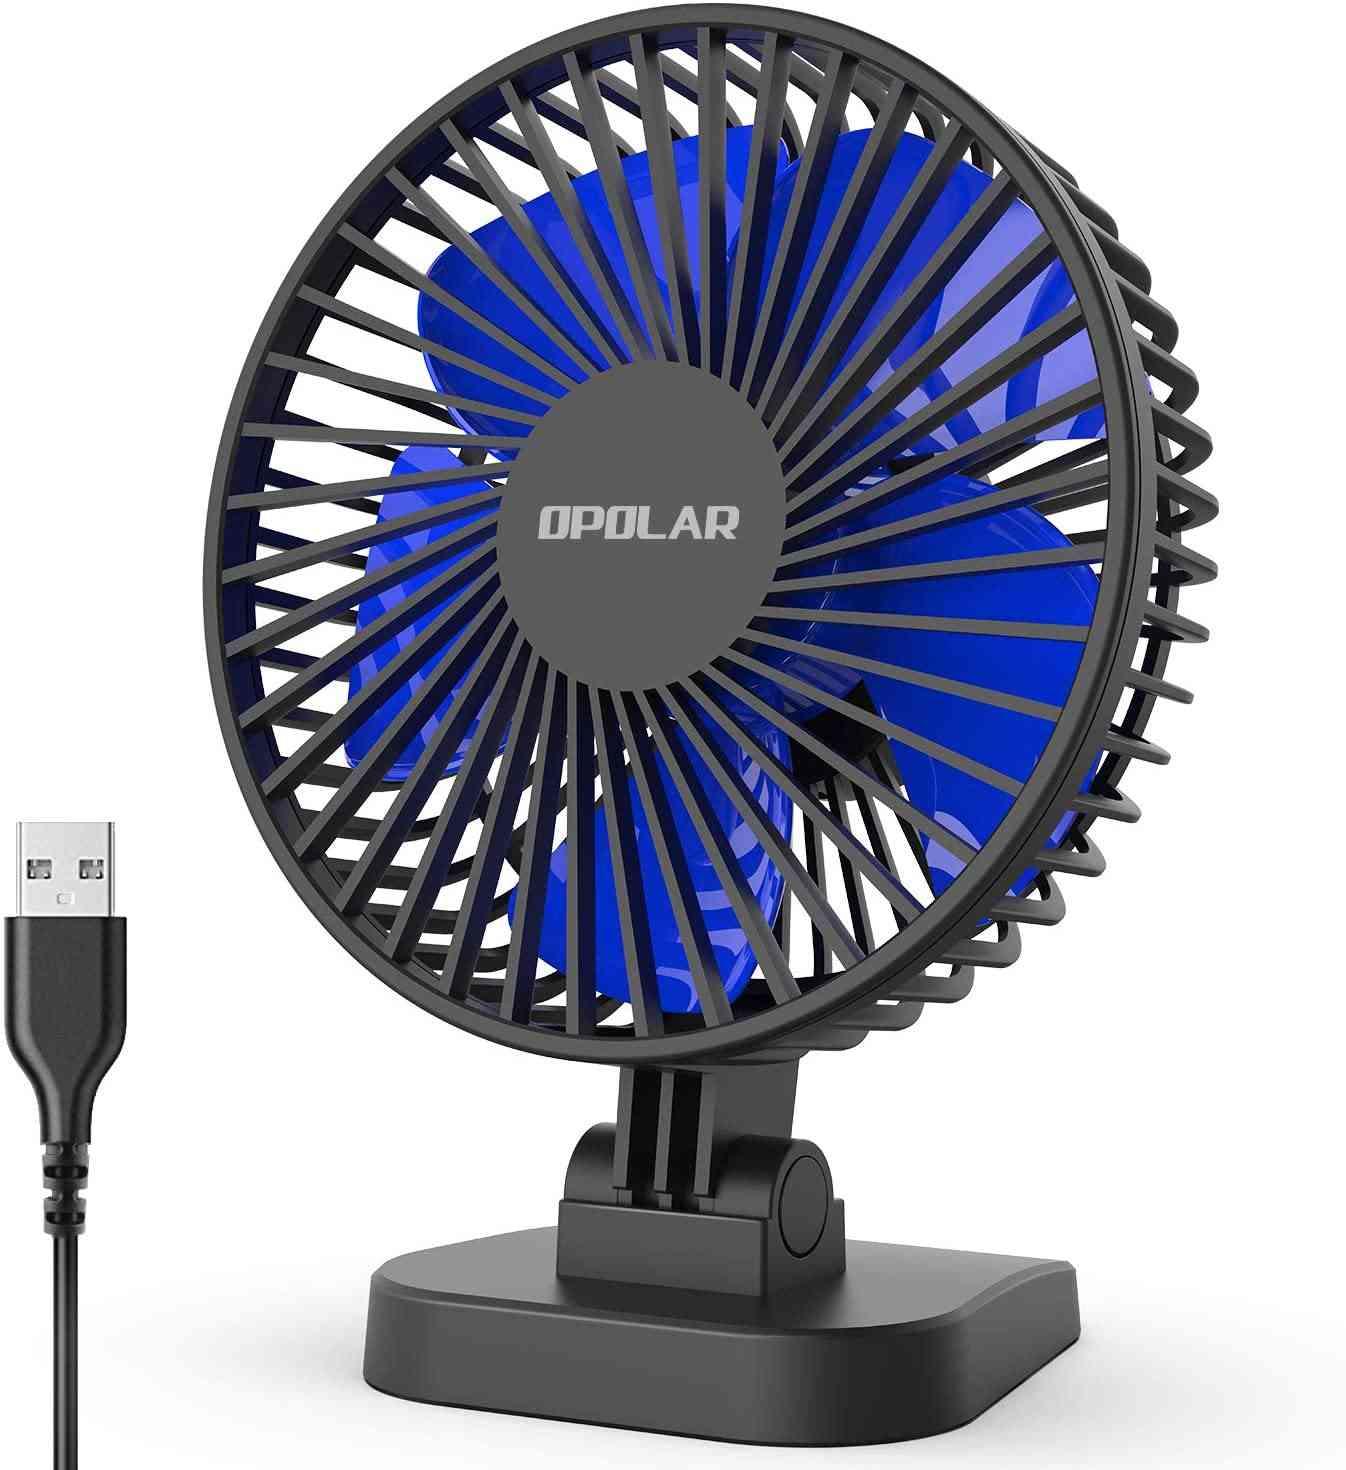 Mini Usb Desk Whisper Quiet Portable Fan For Desktop Office Table